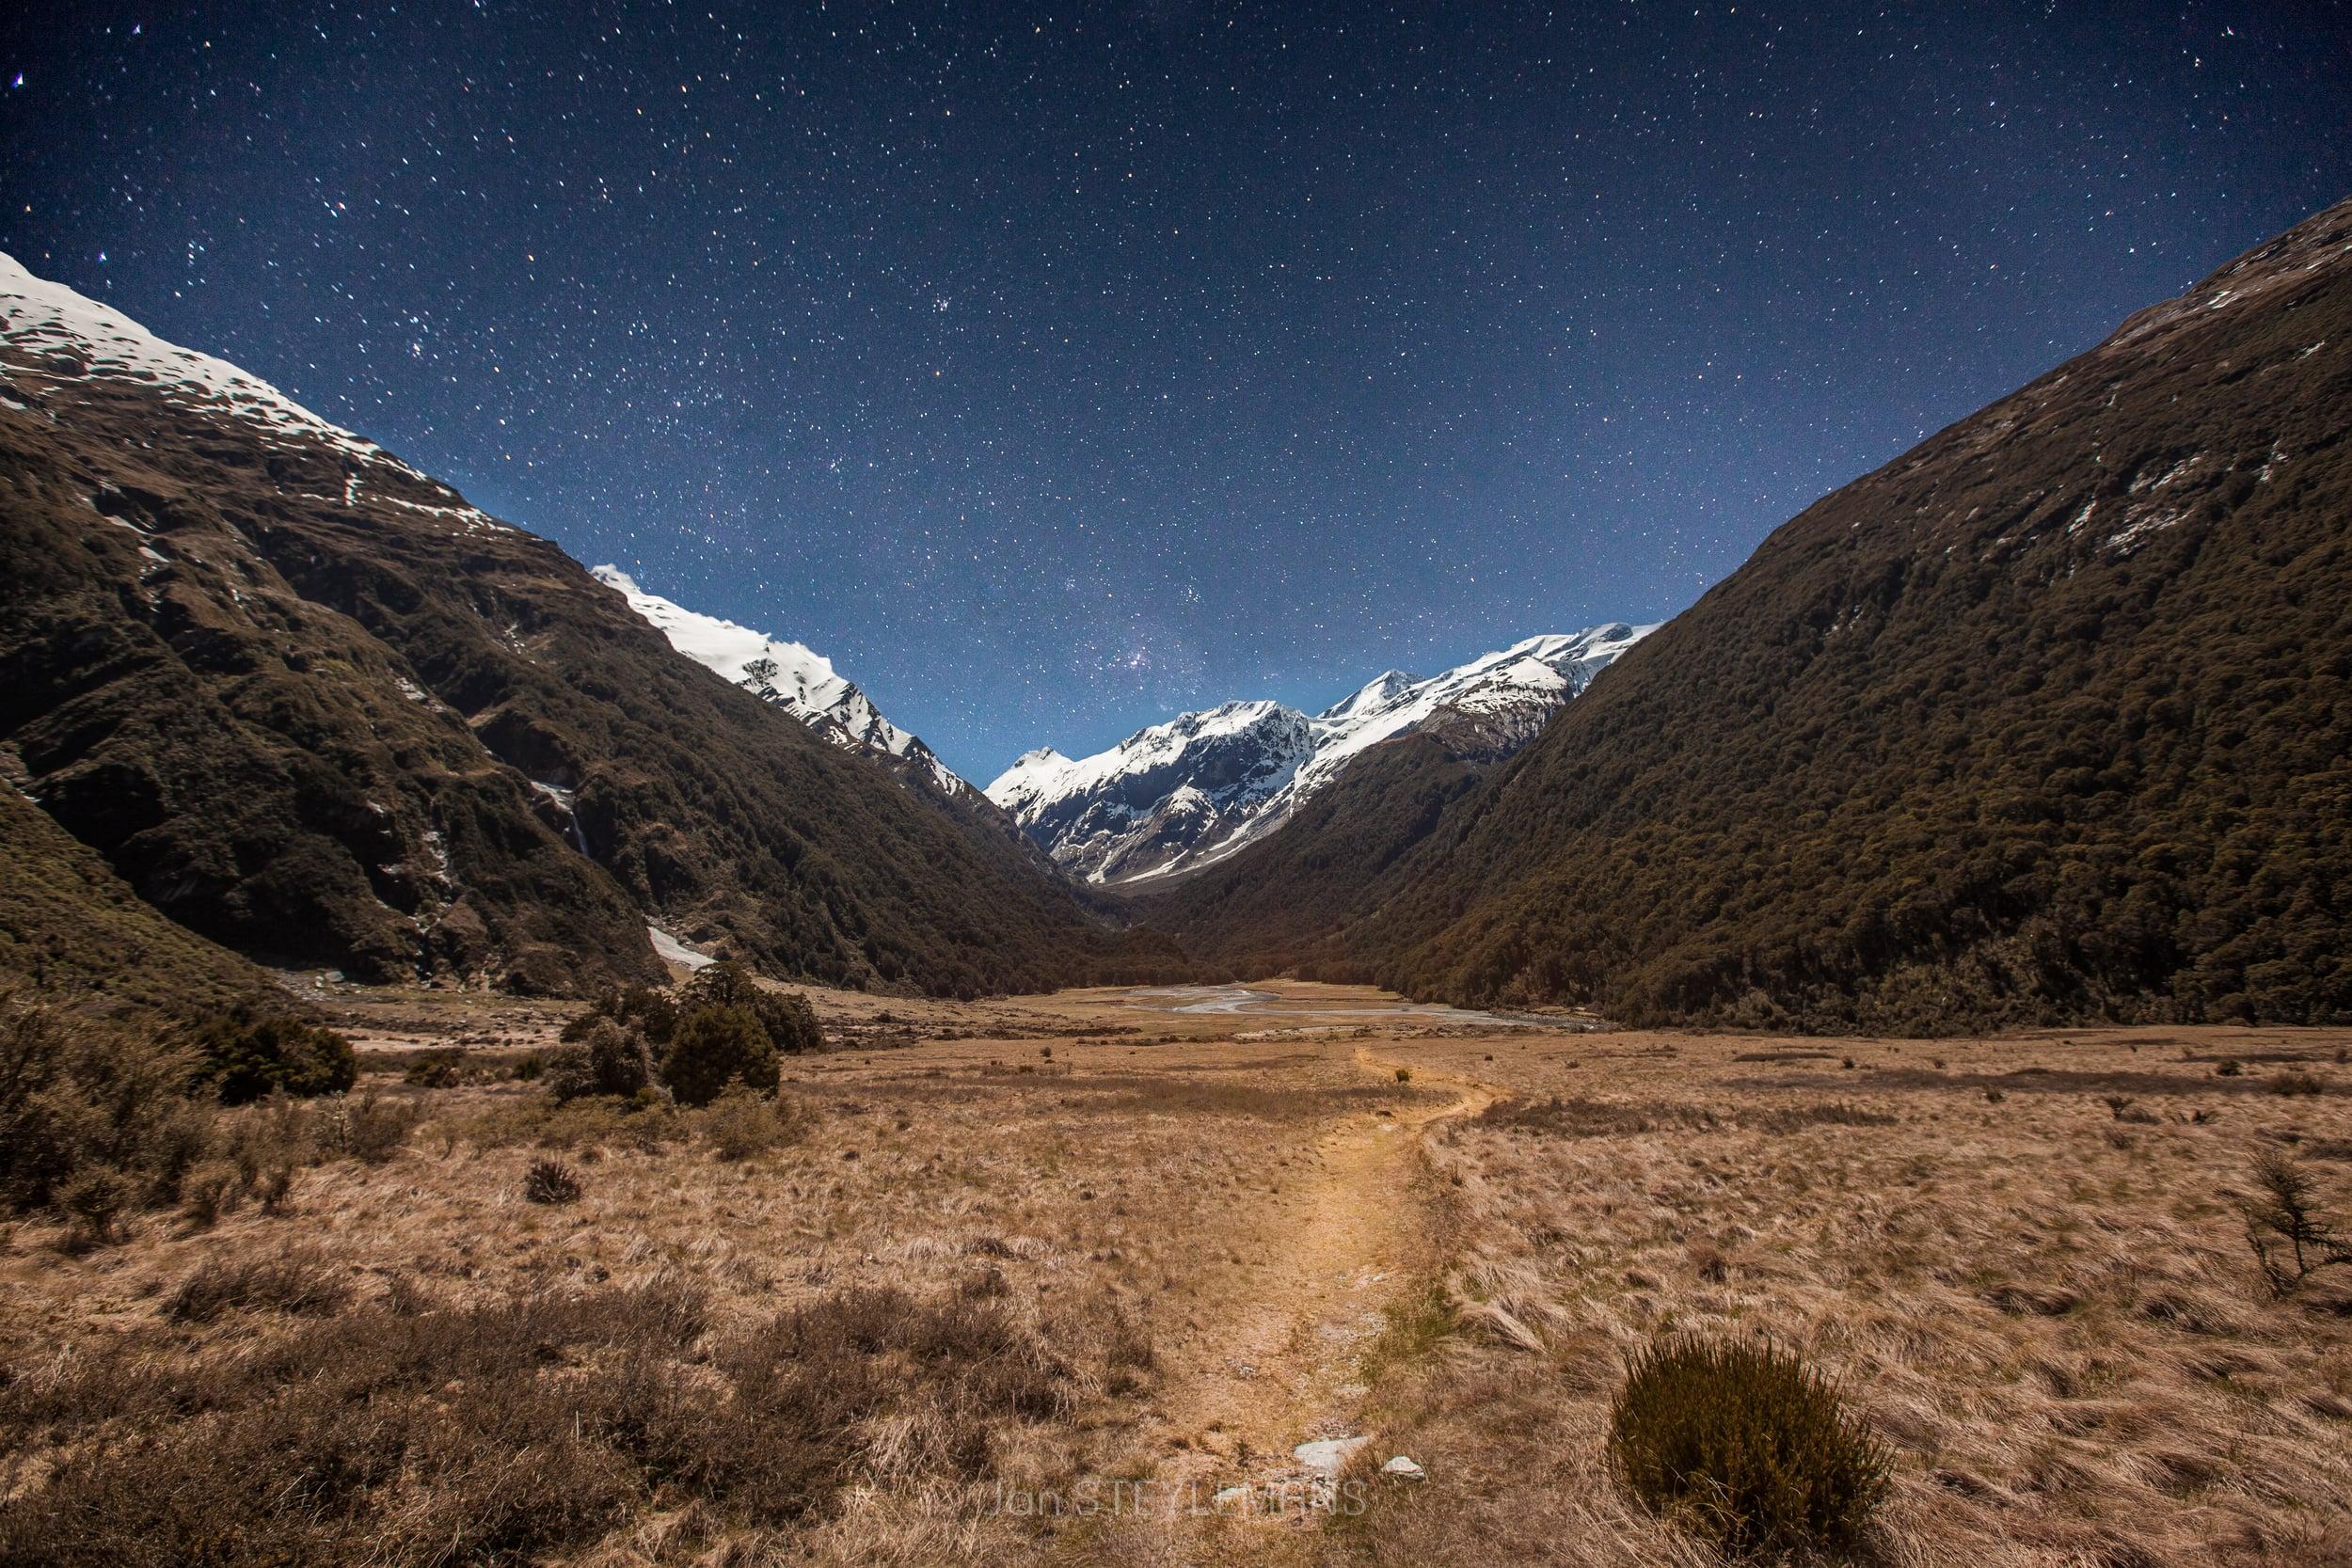 Pearl Flat, Mount Aspiring National Park, New Zealand